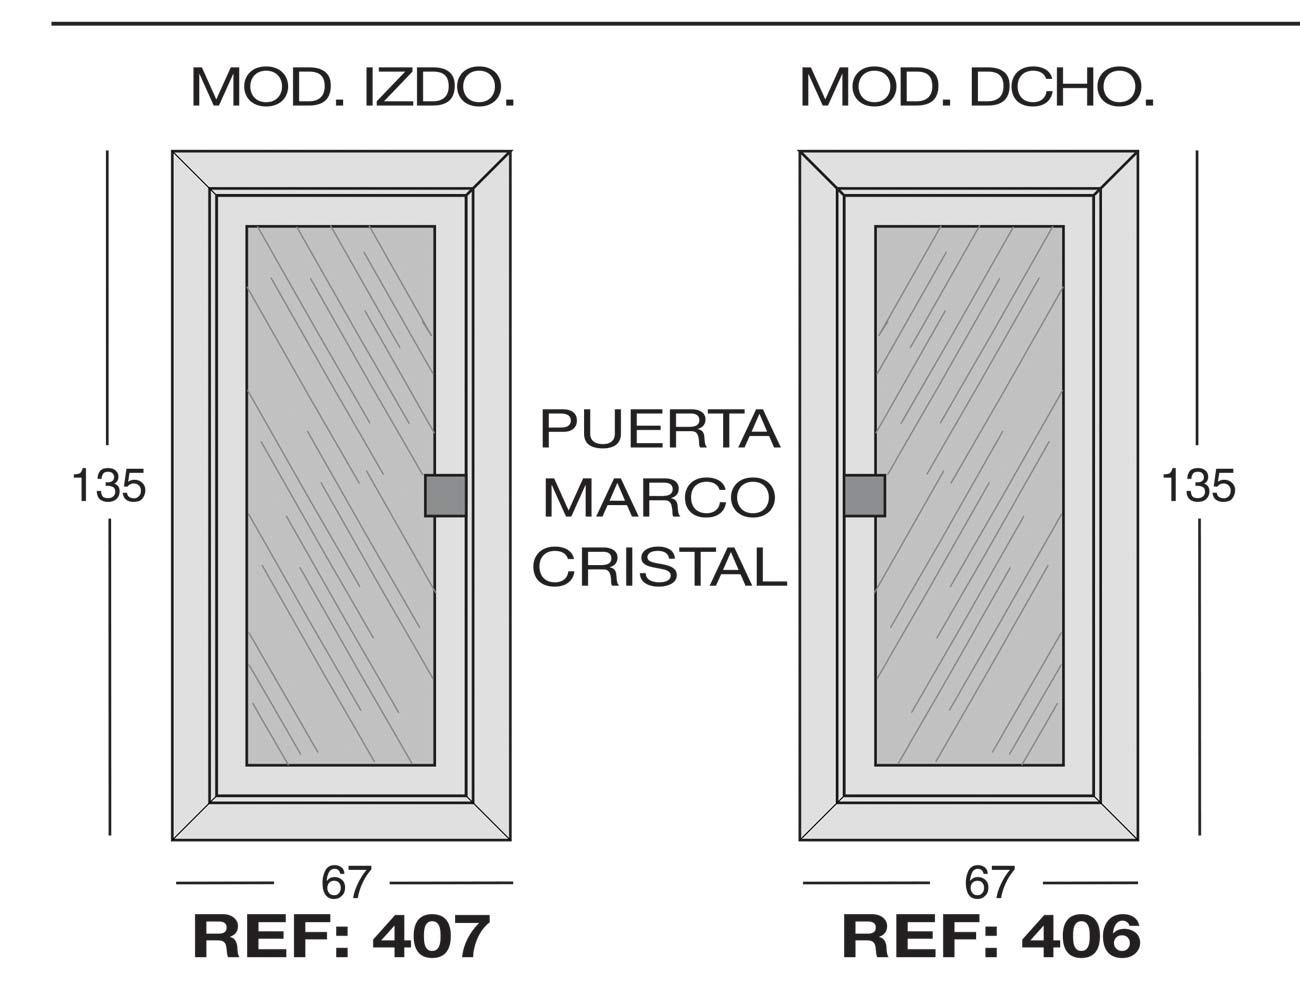 Modulo izdo 407 dcho 406puerta marco cristal1